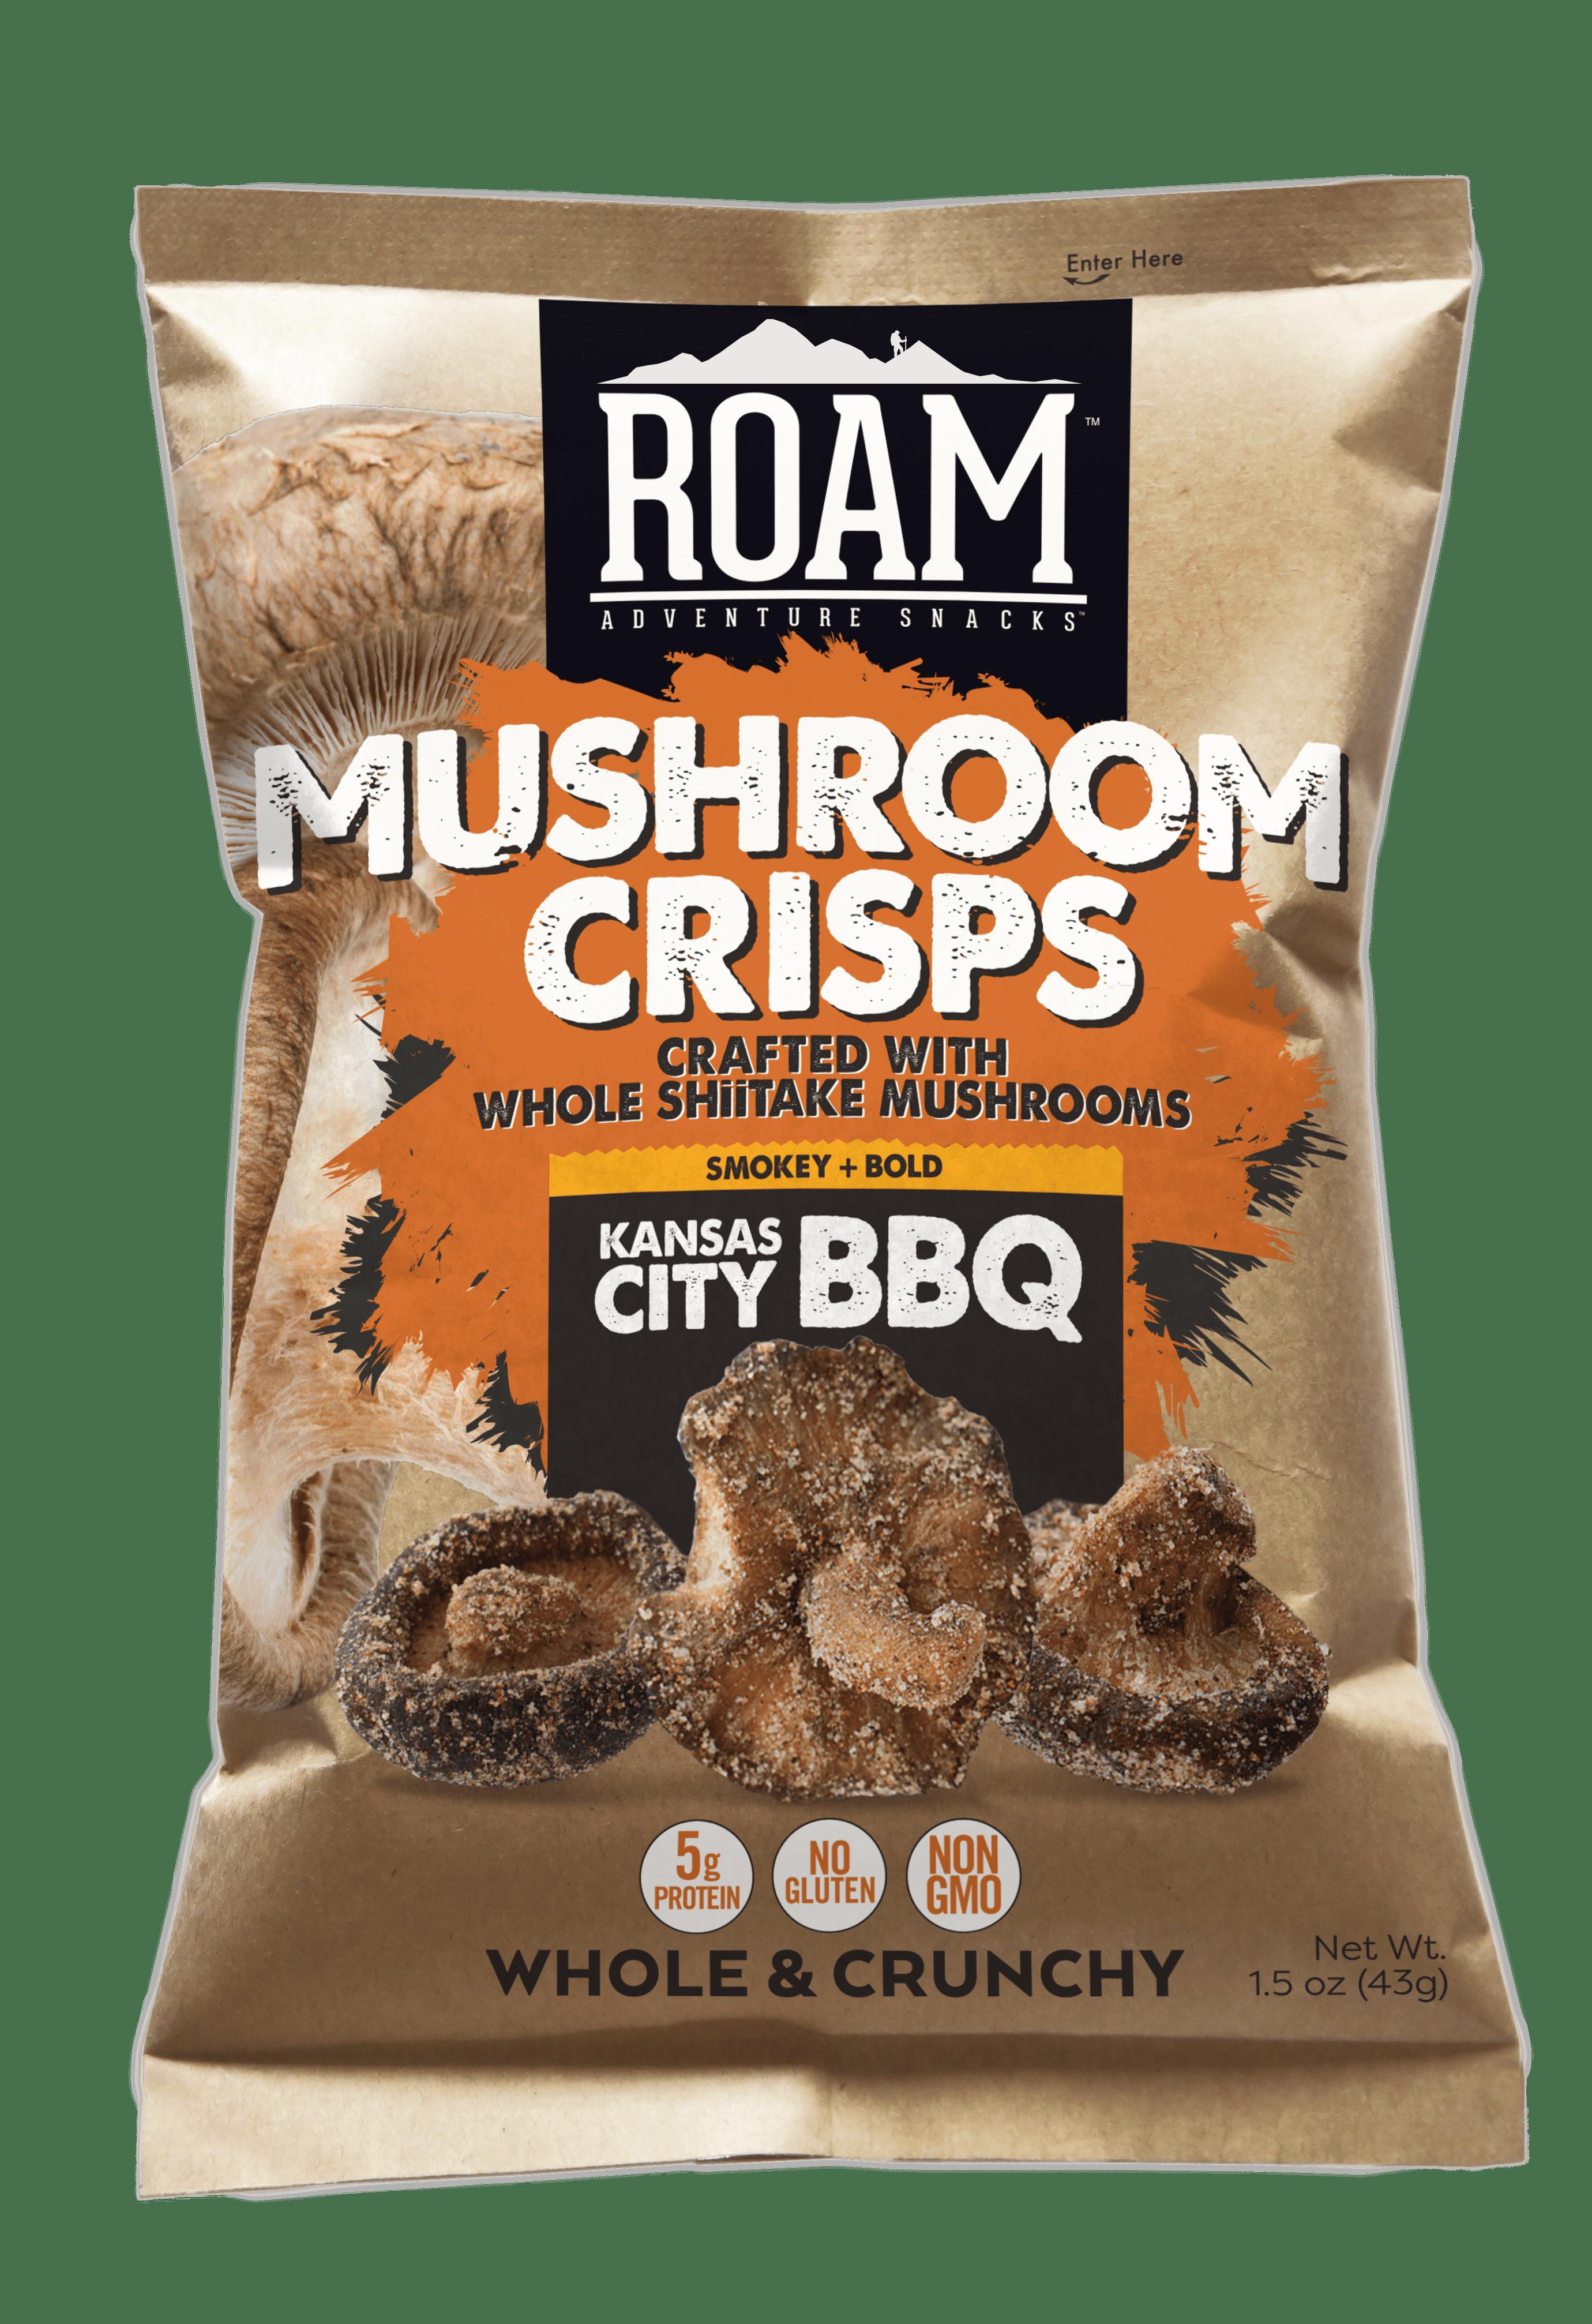 Bag of ROAM bbq mushroom crisps snack